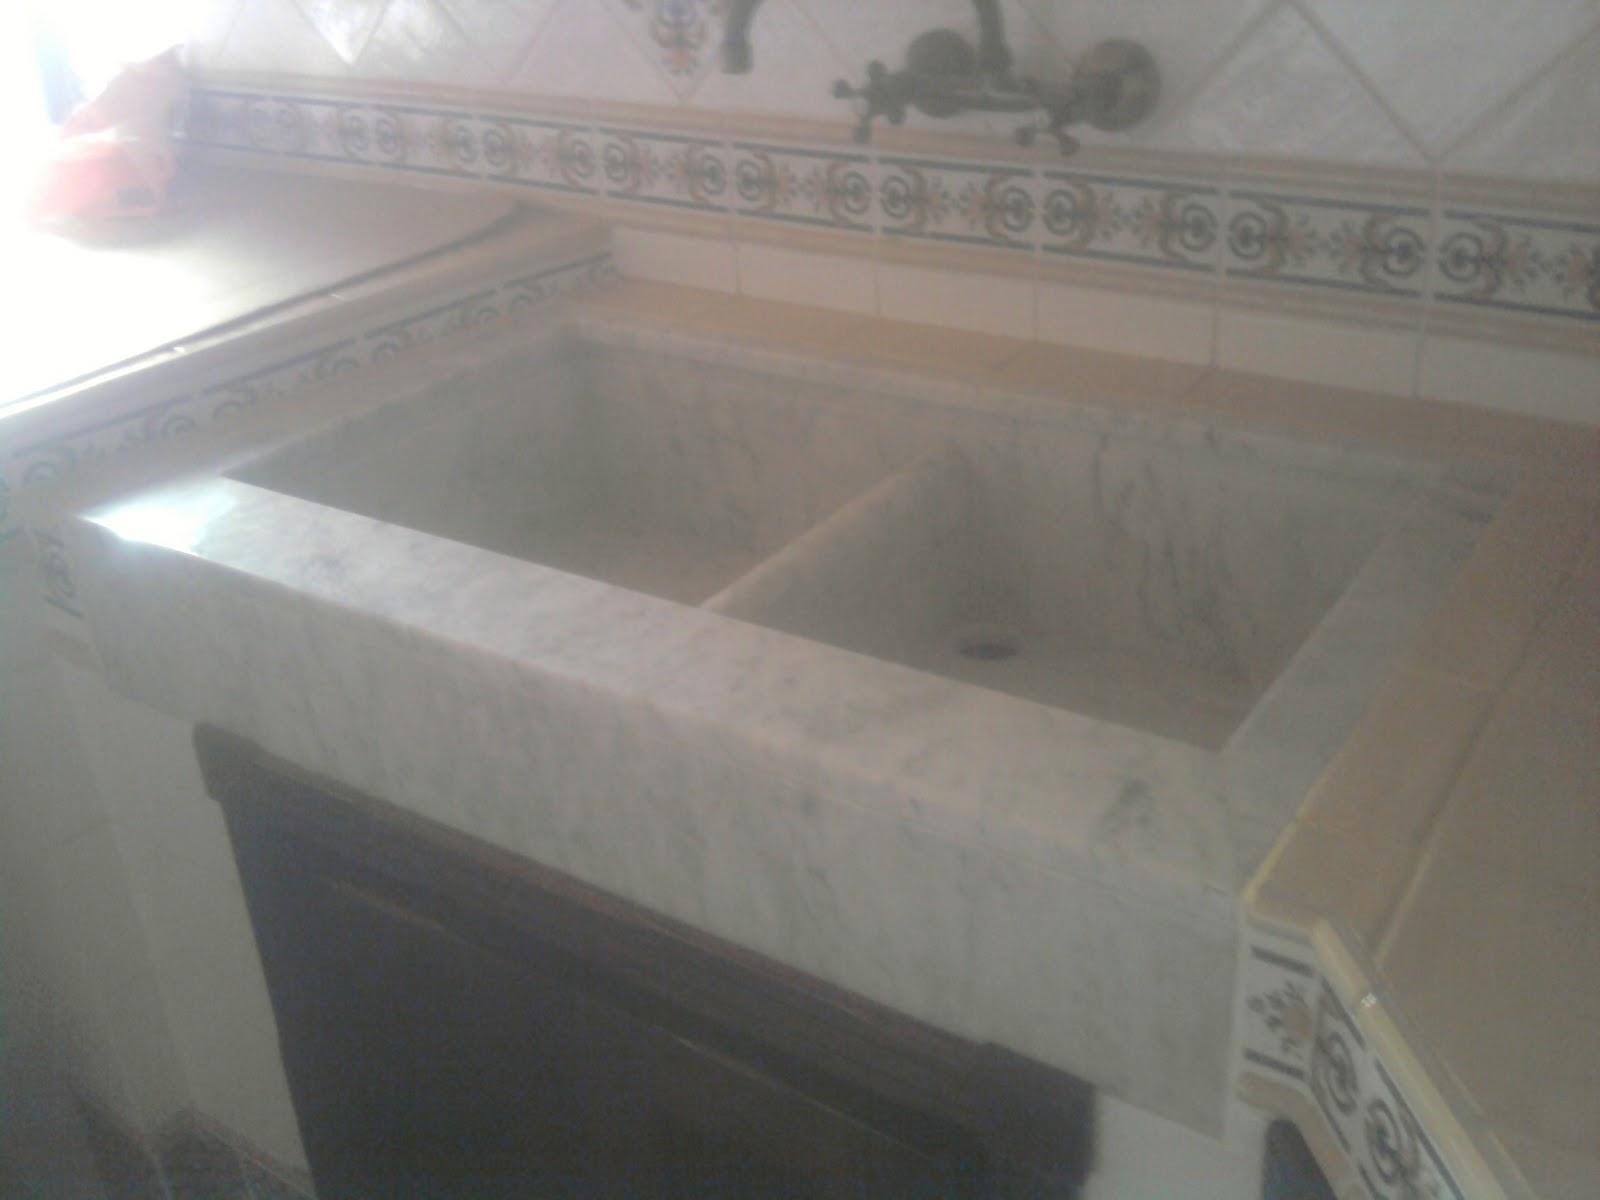 Hnos orellana c b fregadero en marmol - Fregadero marmol ...